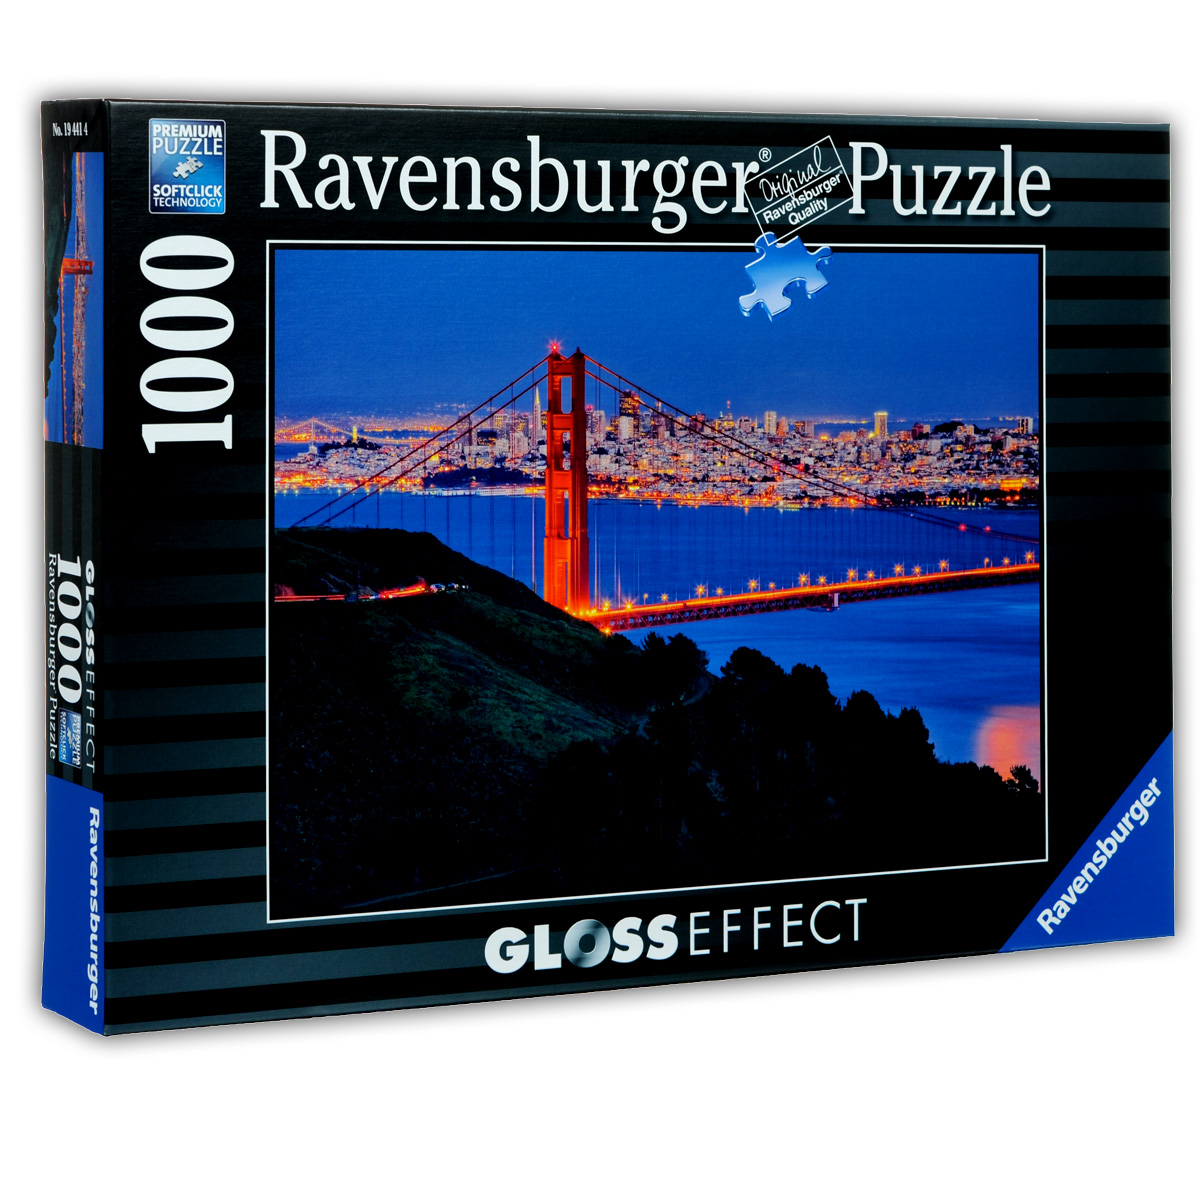 Ravensburger Сан-Франциско. Пазл с глянцевым эффектом, 1000 элементов